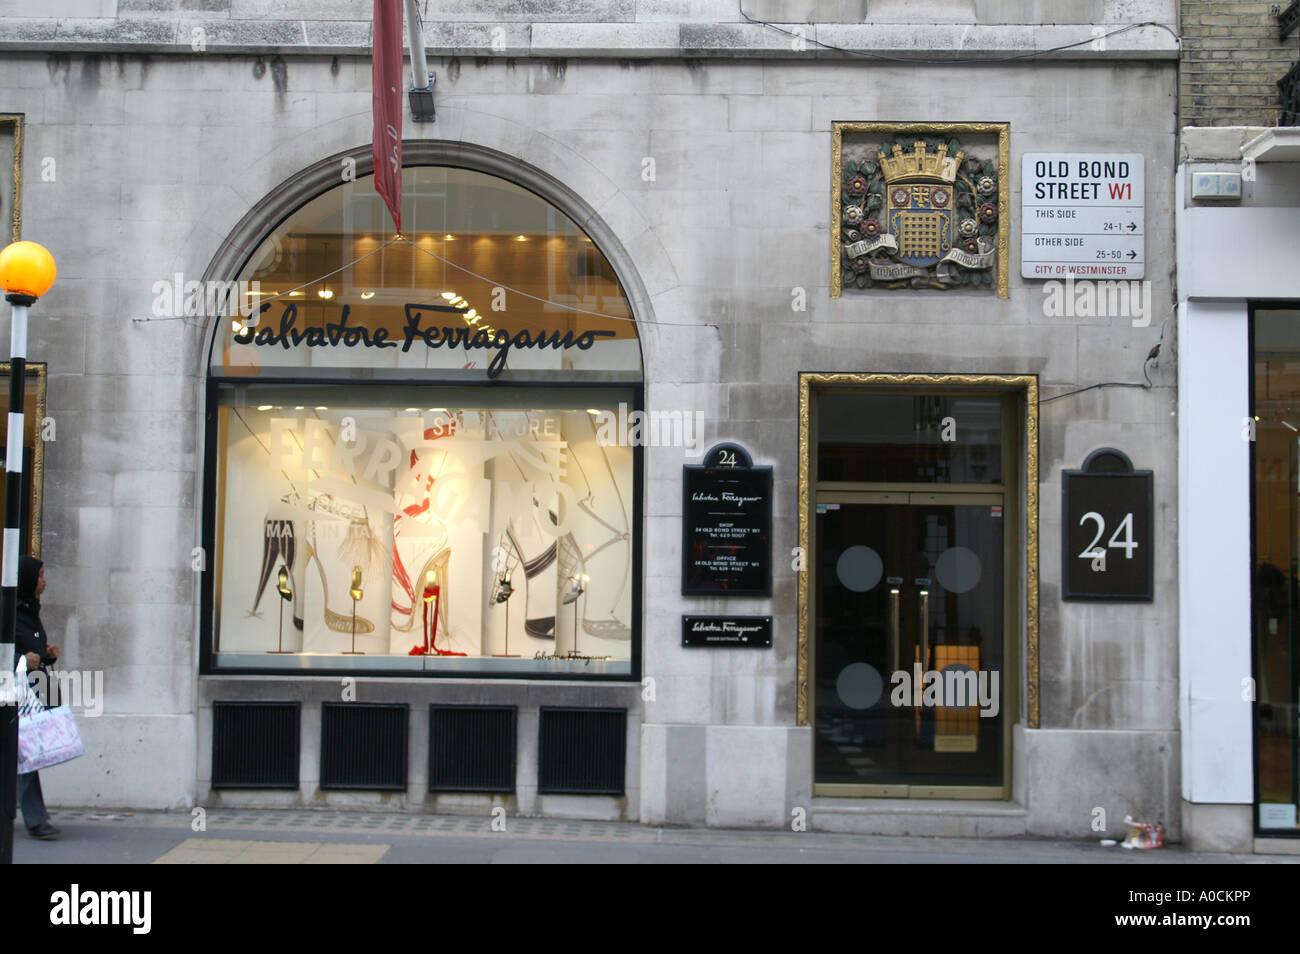 Salvadore Ferragamo 24 Old Bond Street London - Stock Image